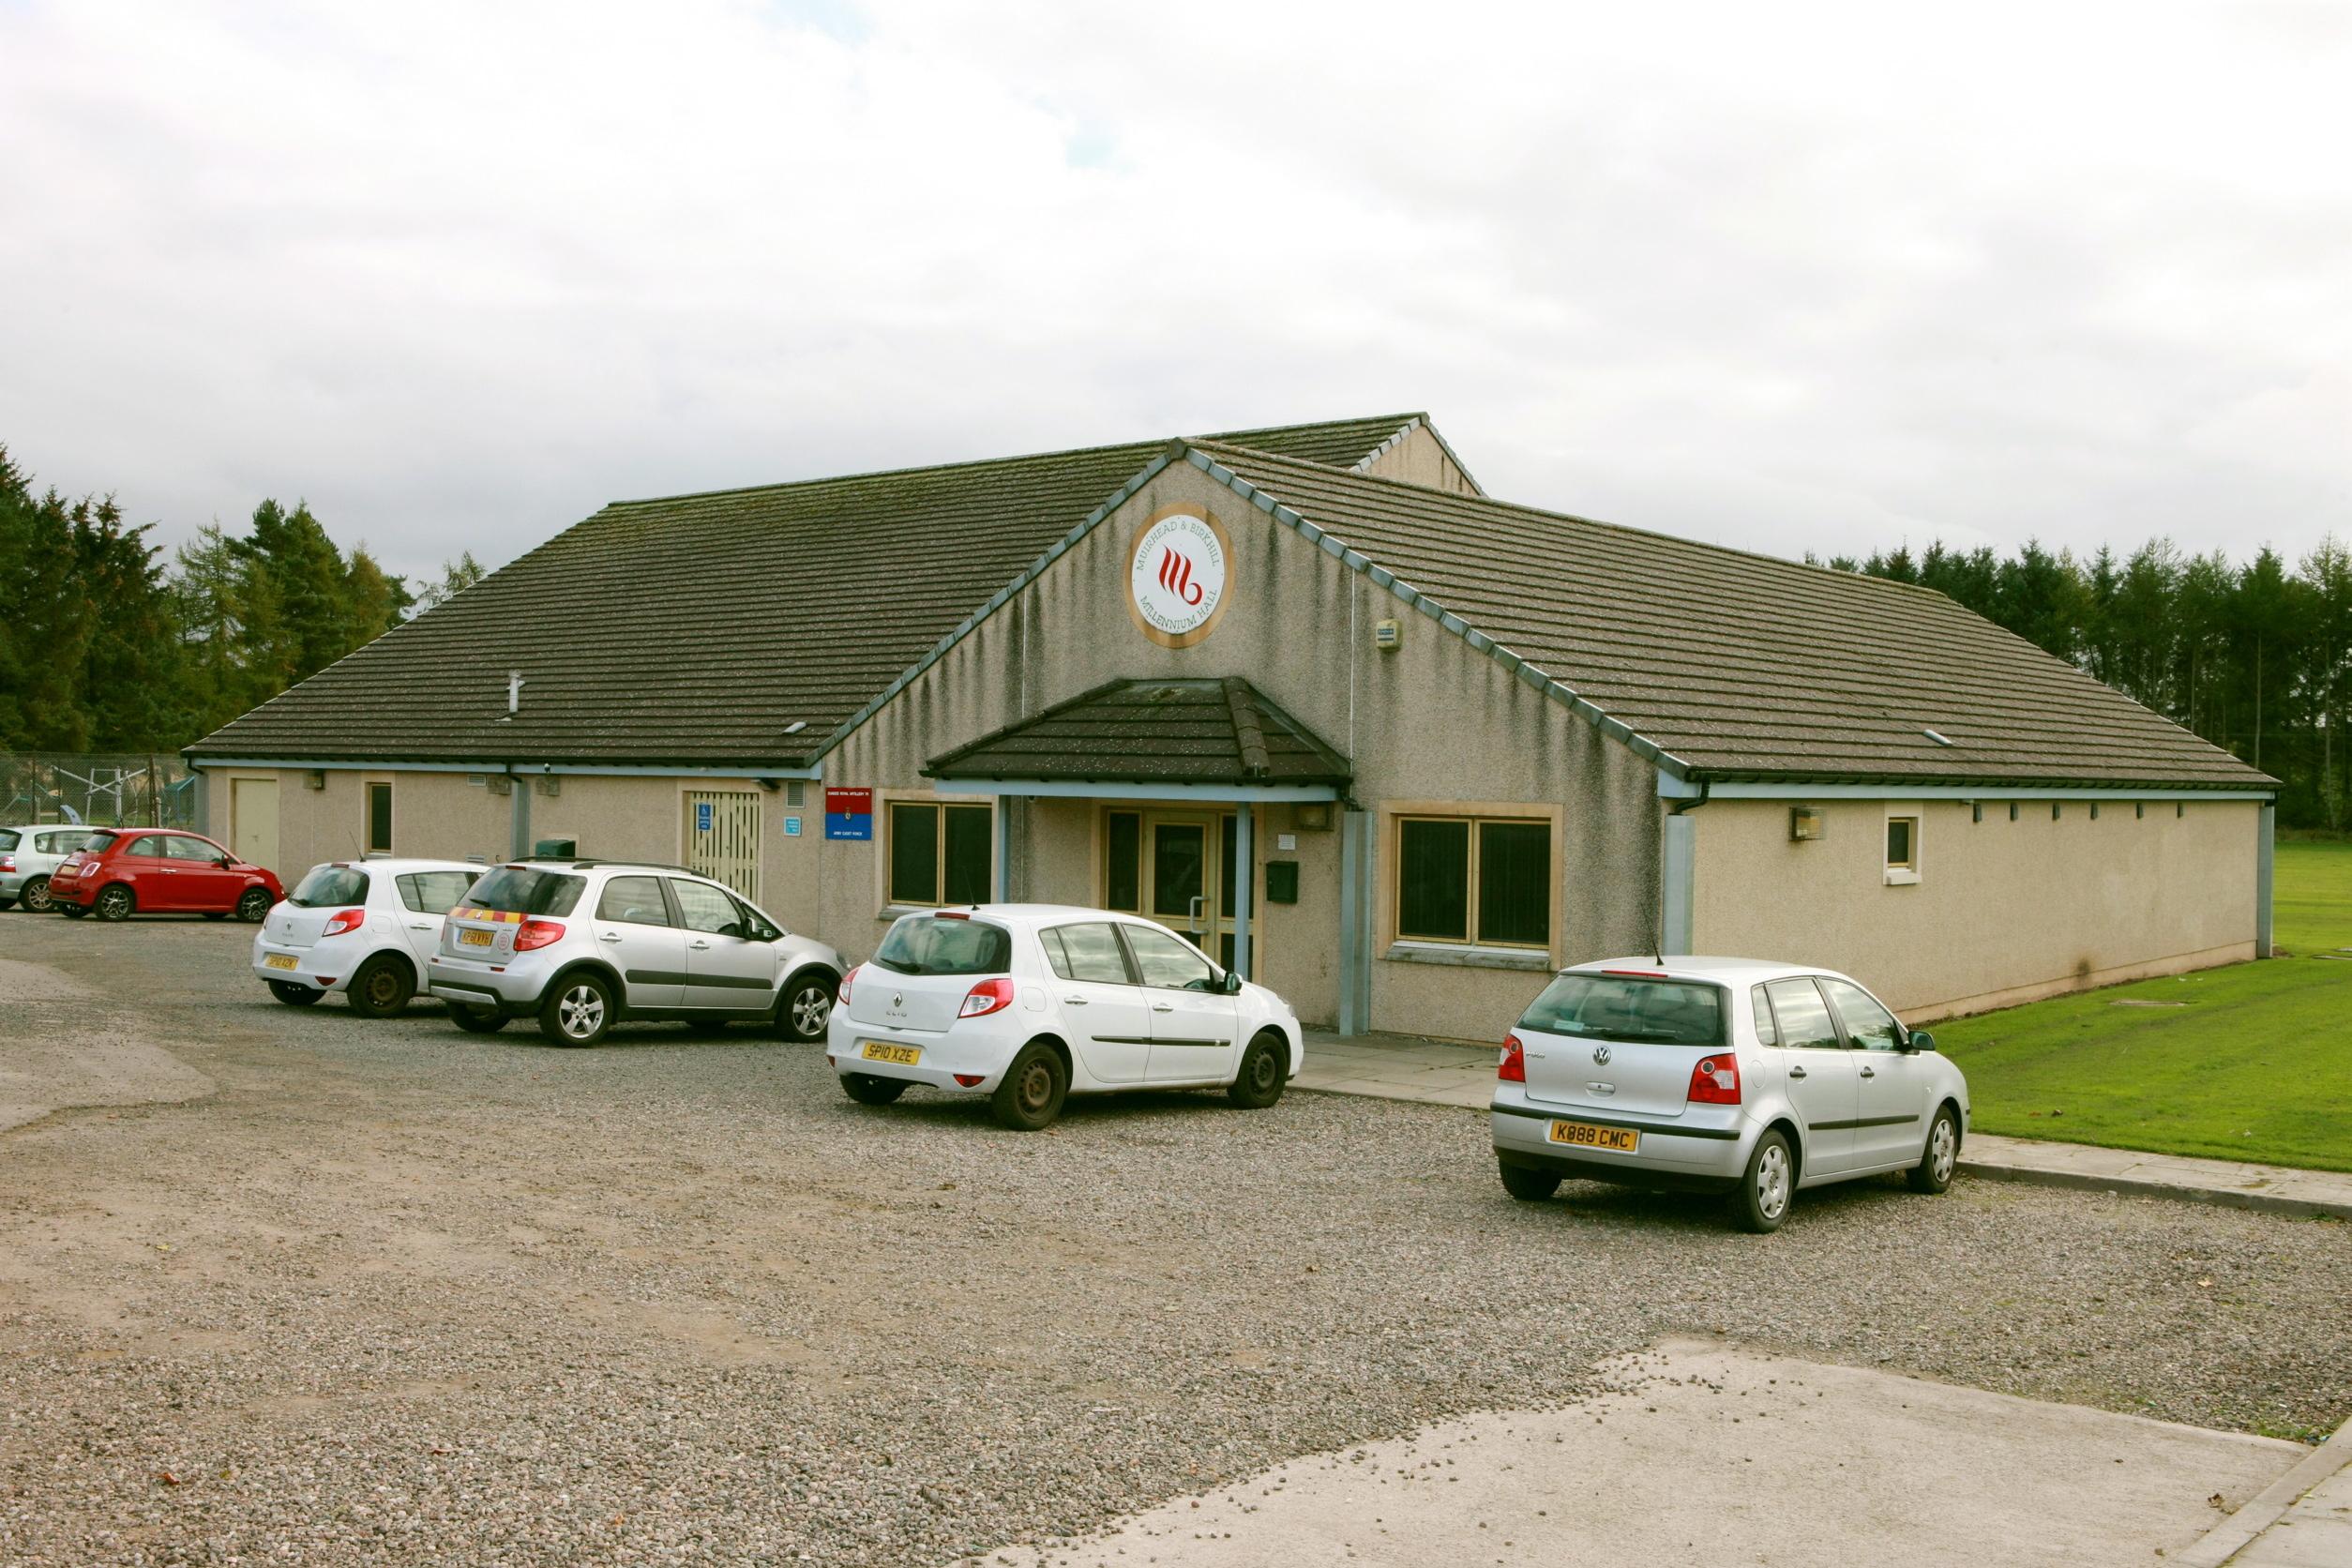 The Birkhill and Muirhead Millenium Hall.